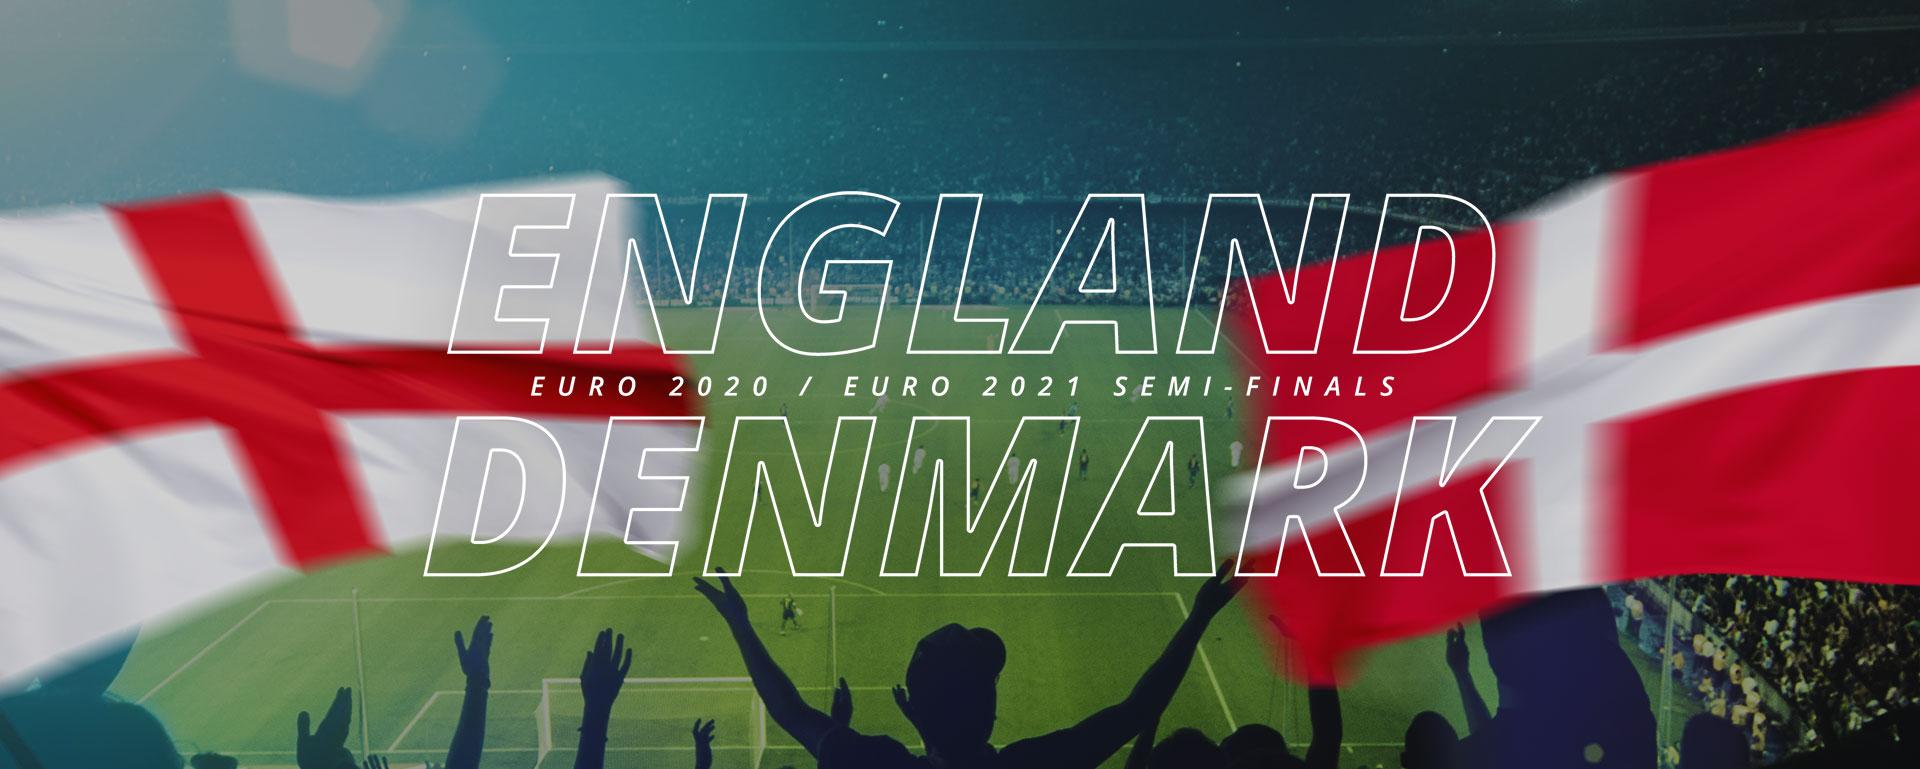 ENGLAND VS DENMARK: BETTING PREVIEW